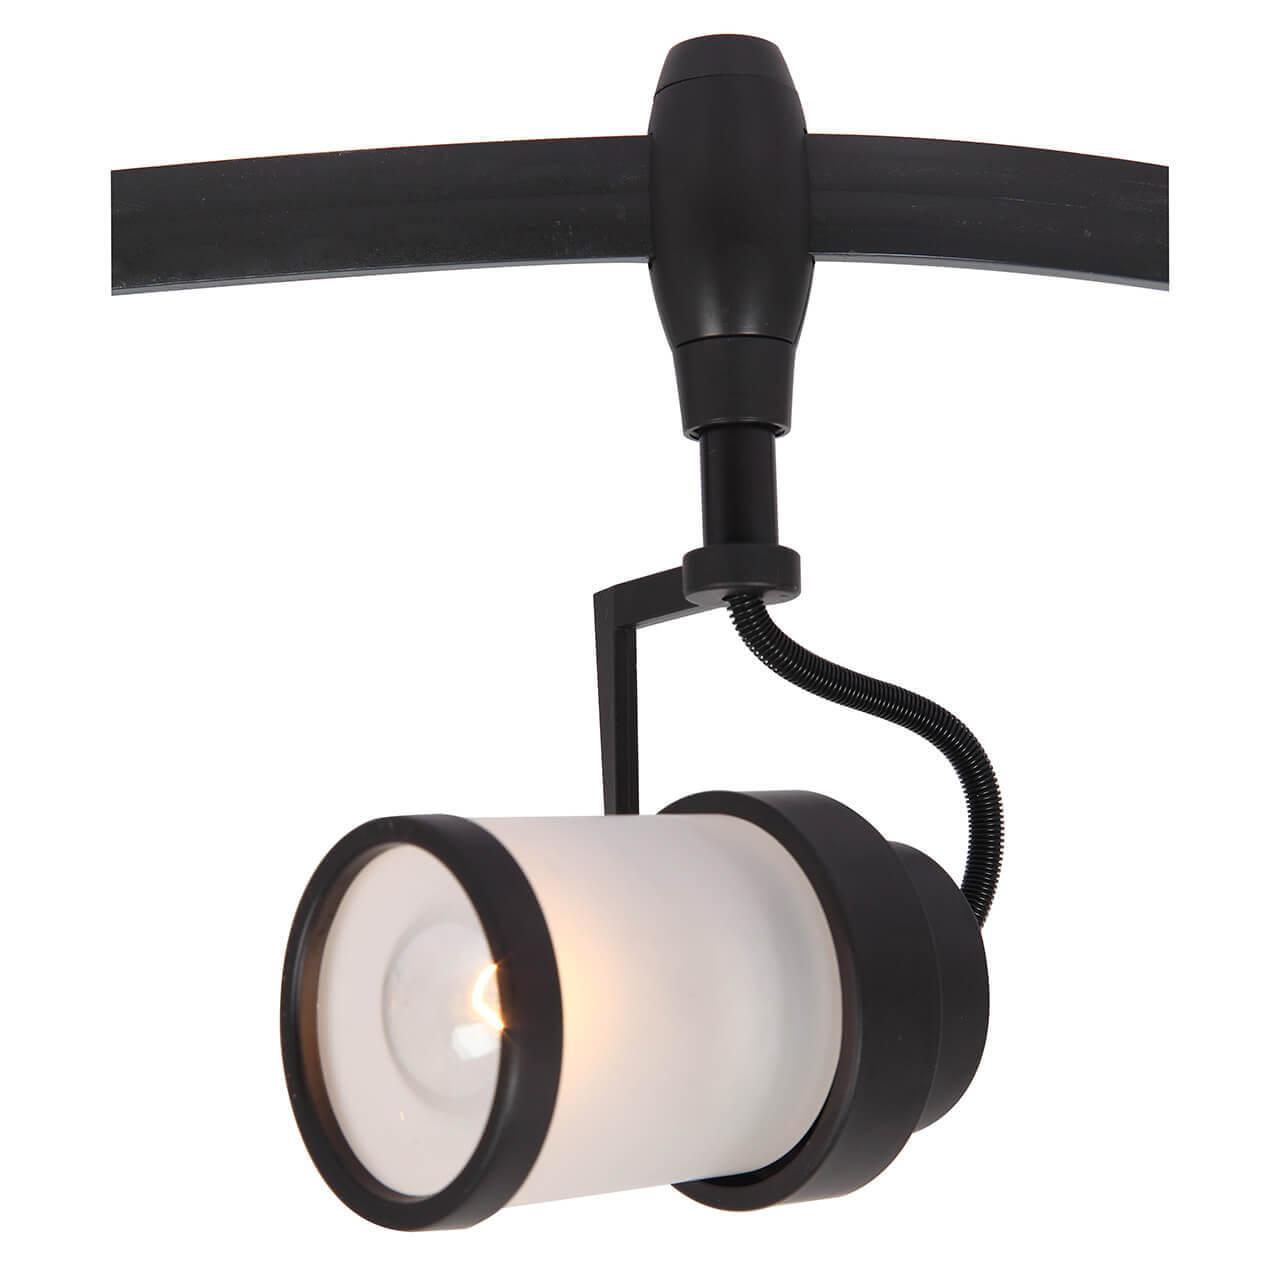 Светильник Arte Lamp A3056PL-1BK A3056 Black